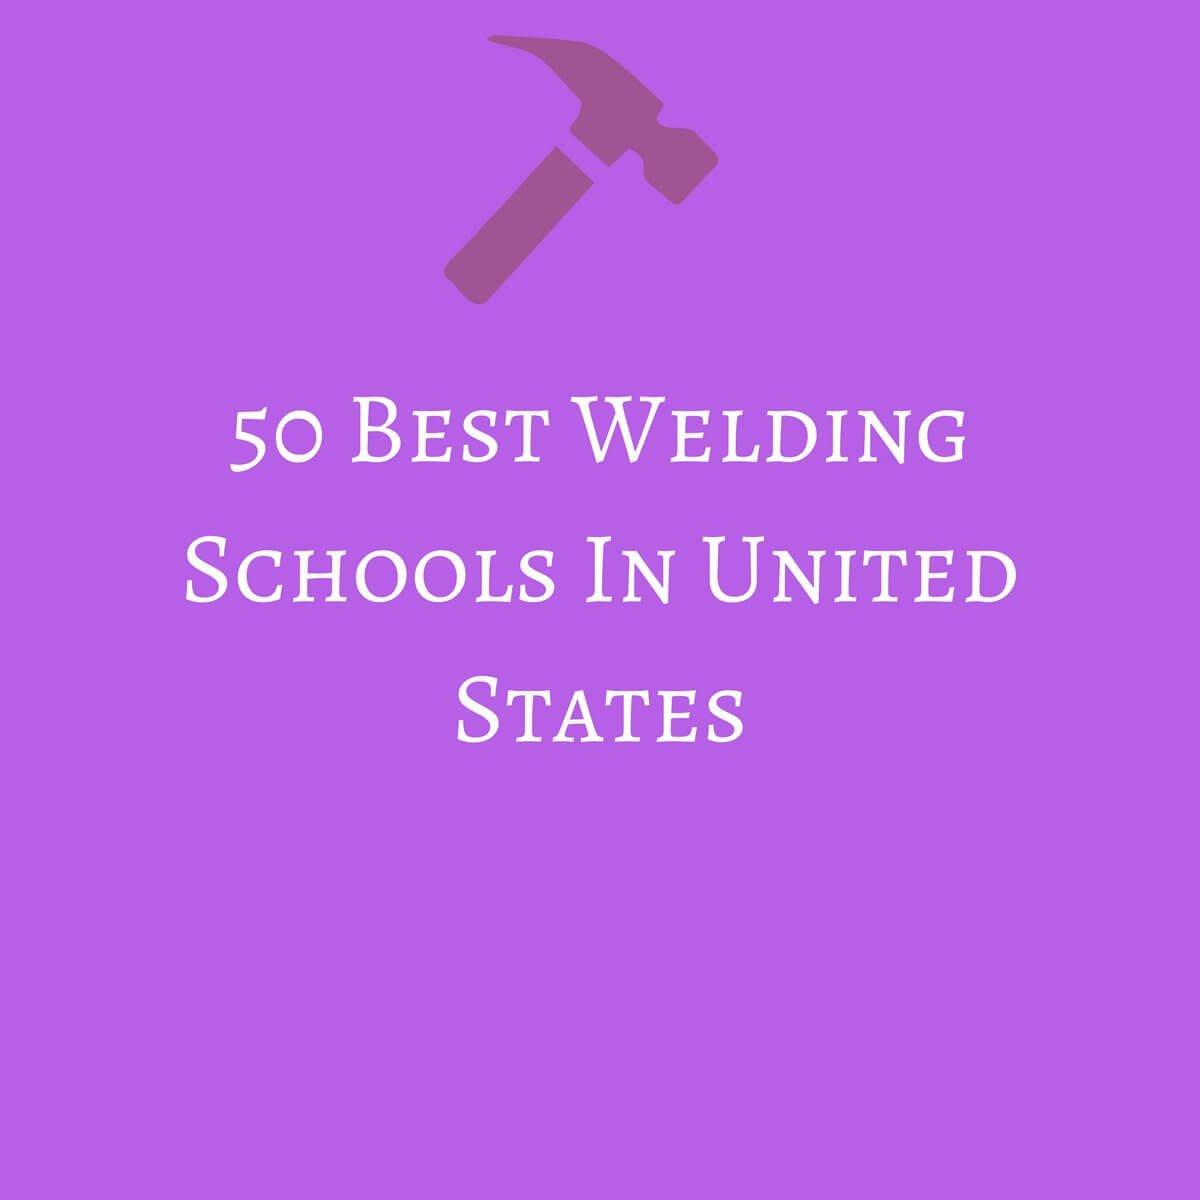 50 Best Welding Schools In United States